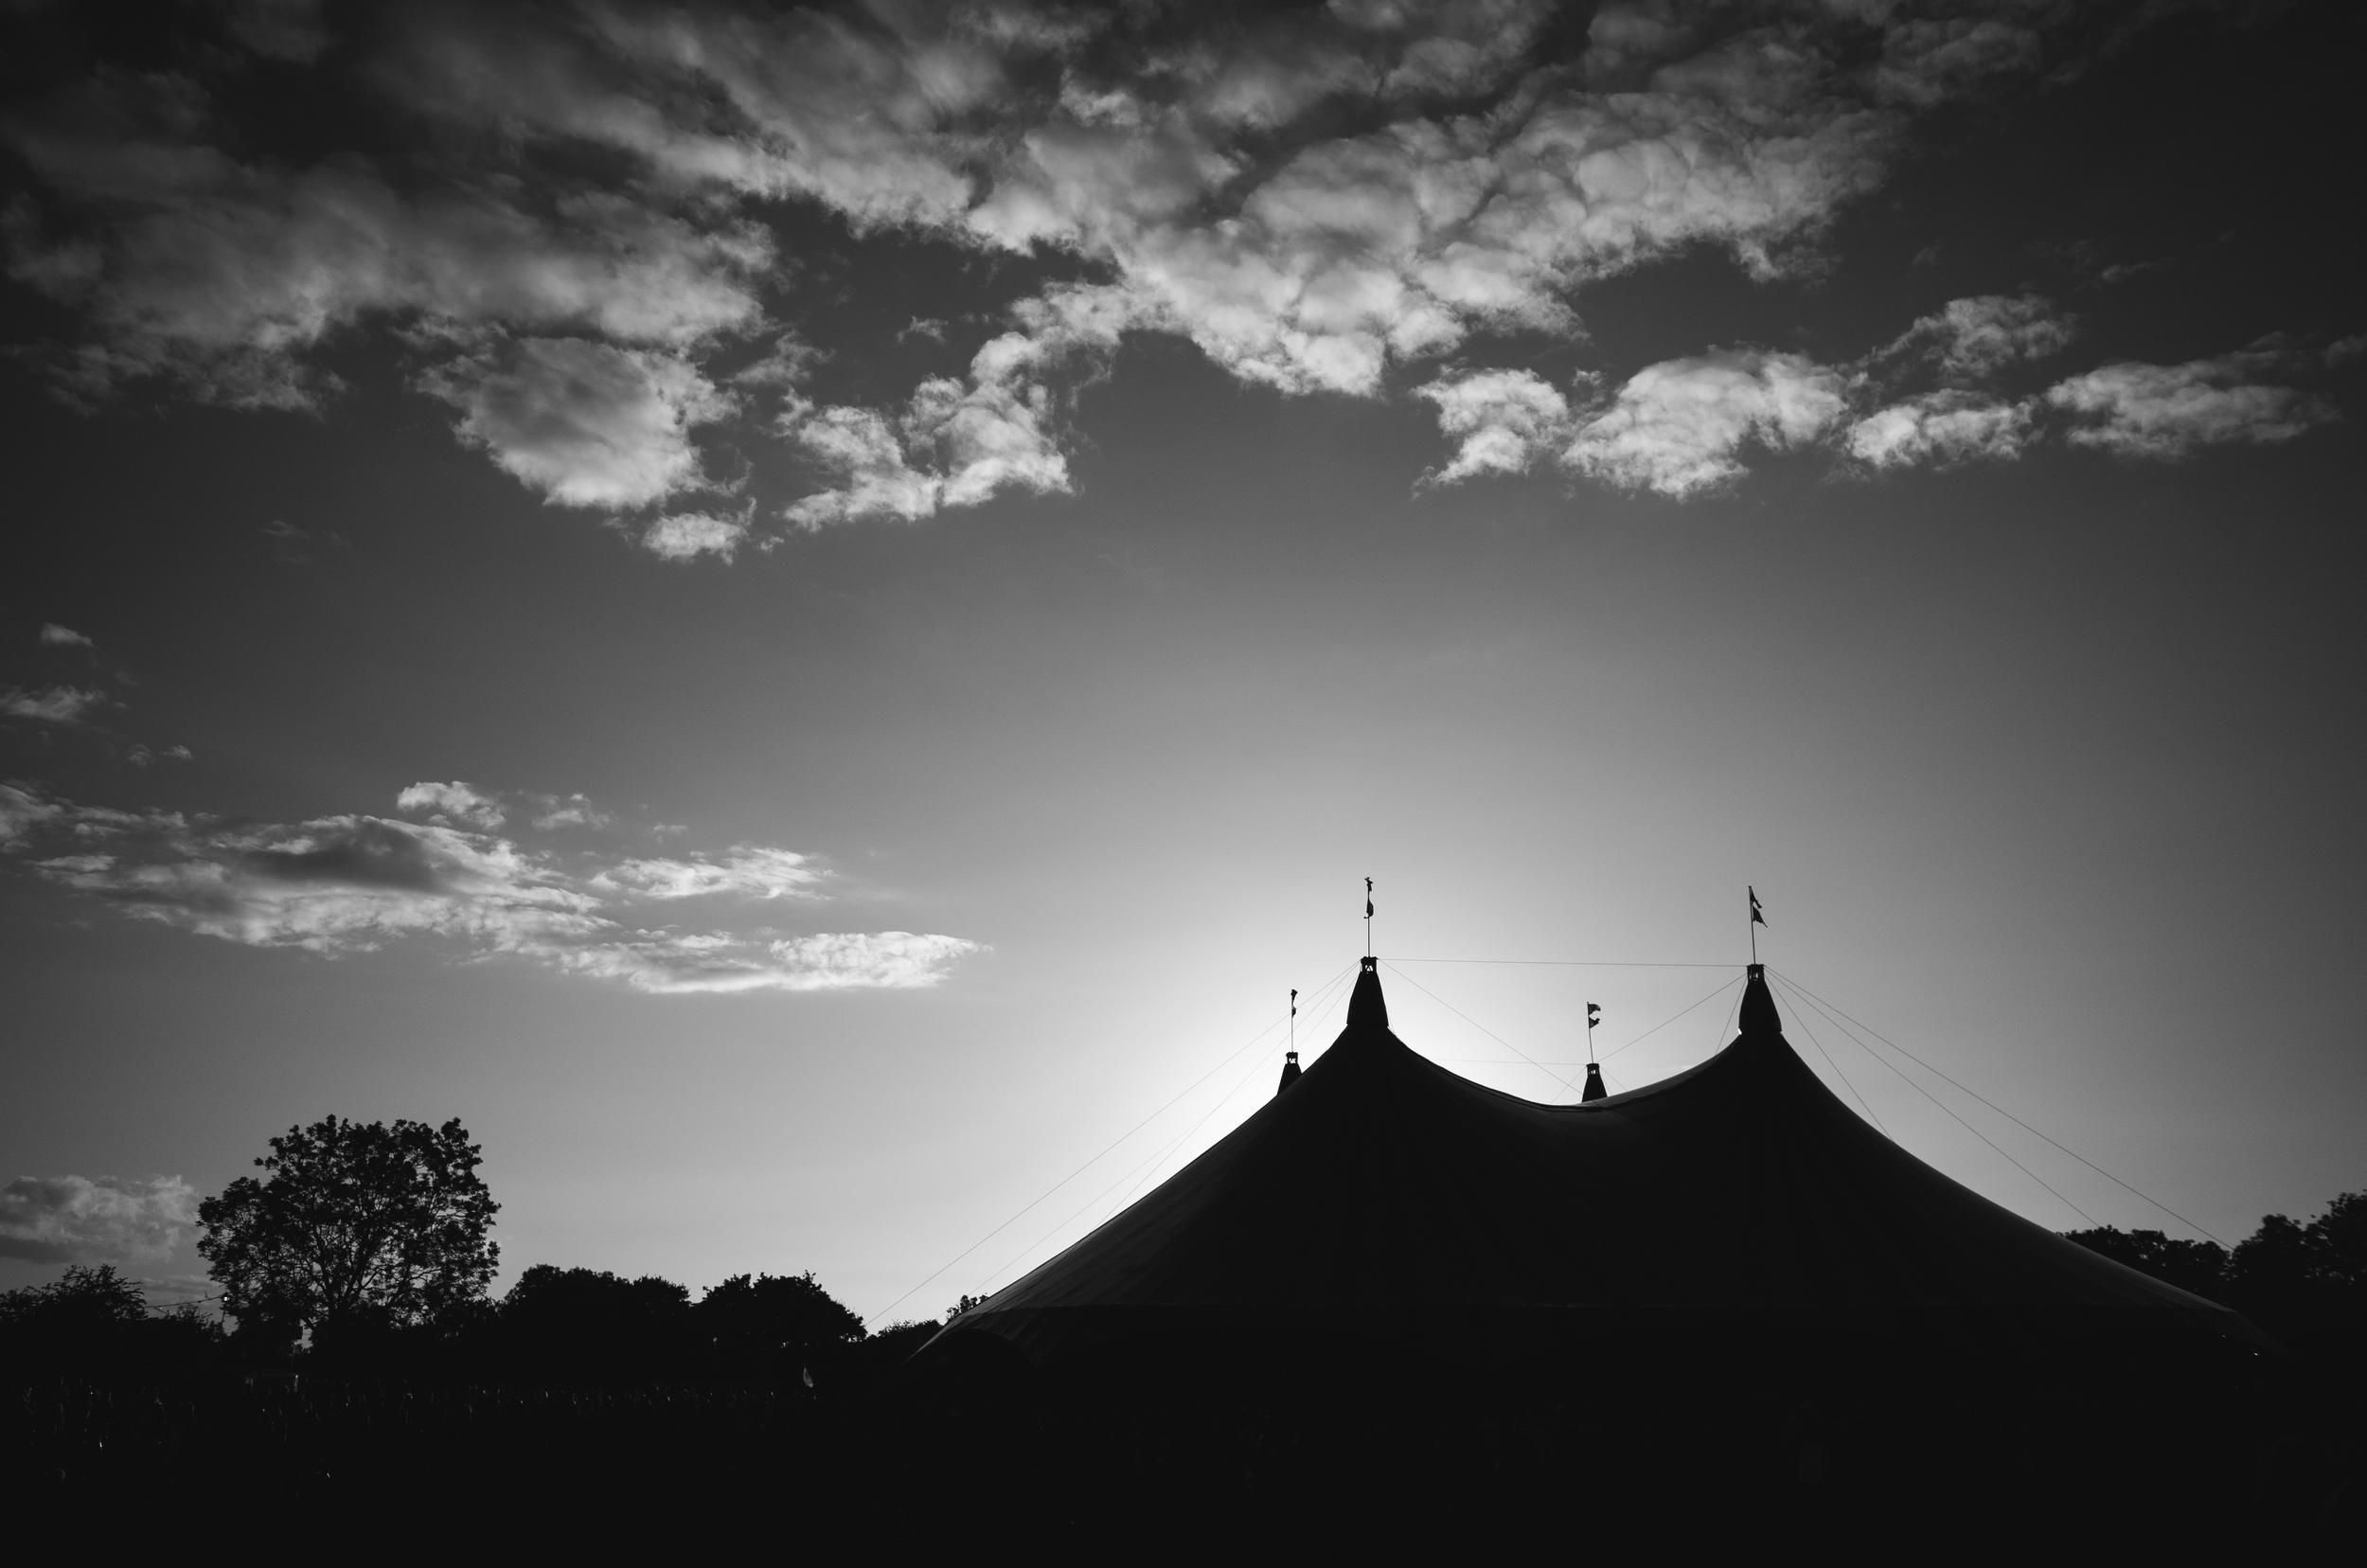 John Peel Stage - Clifford Darby 2017